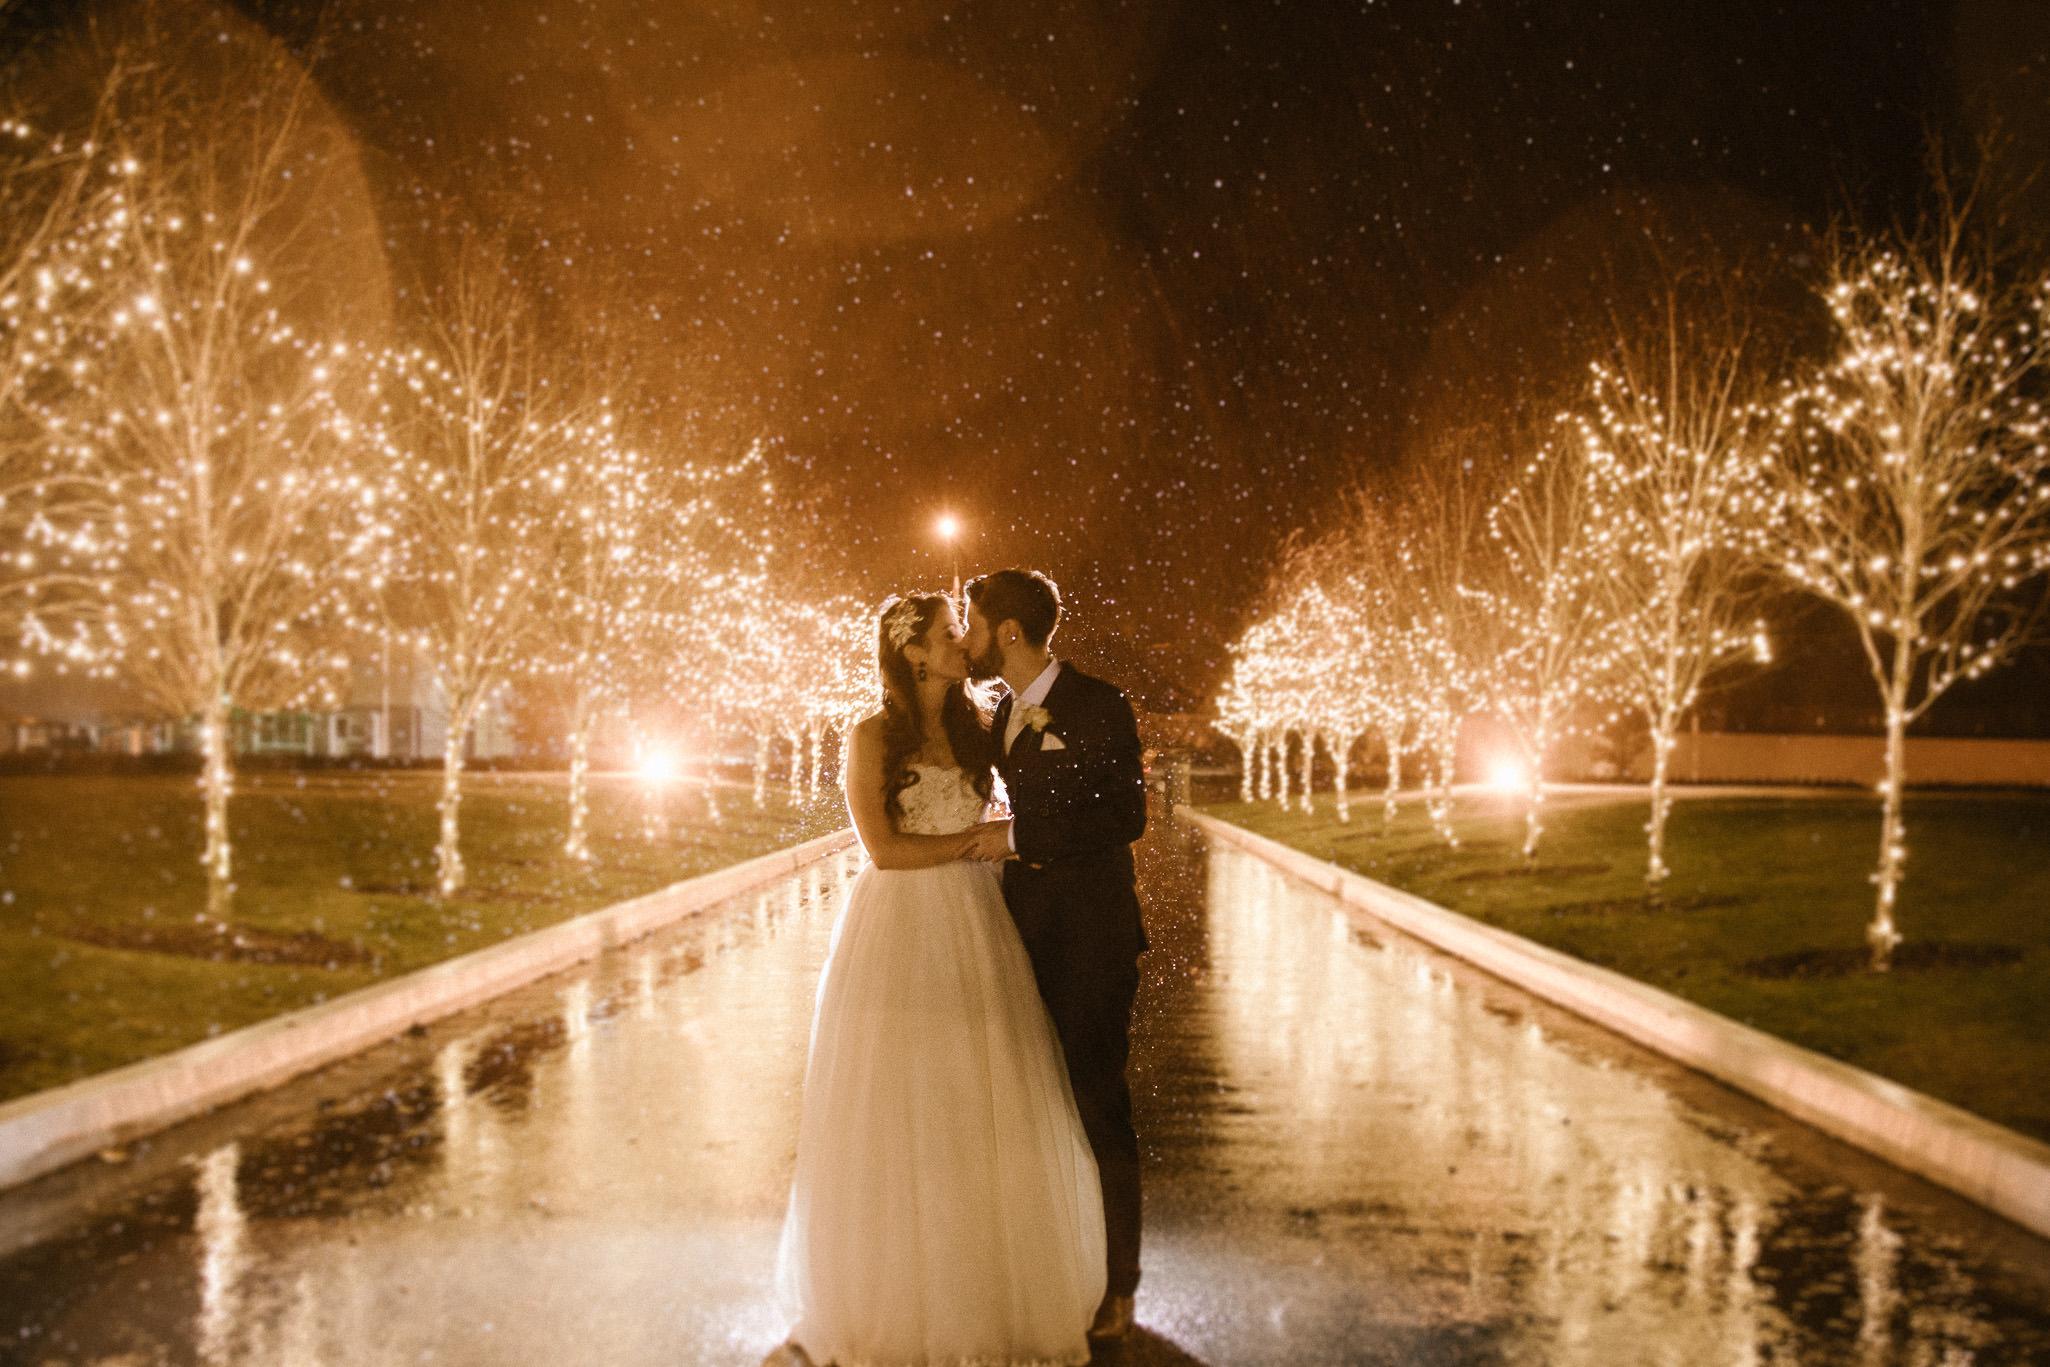 clairebyrnephotography-wedding-night-sparklers-new-years-eve-denyce-leonard-21.jpg